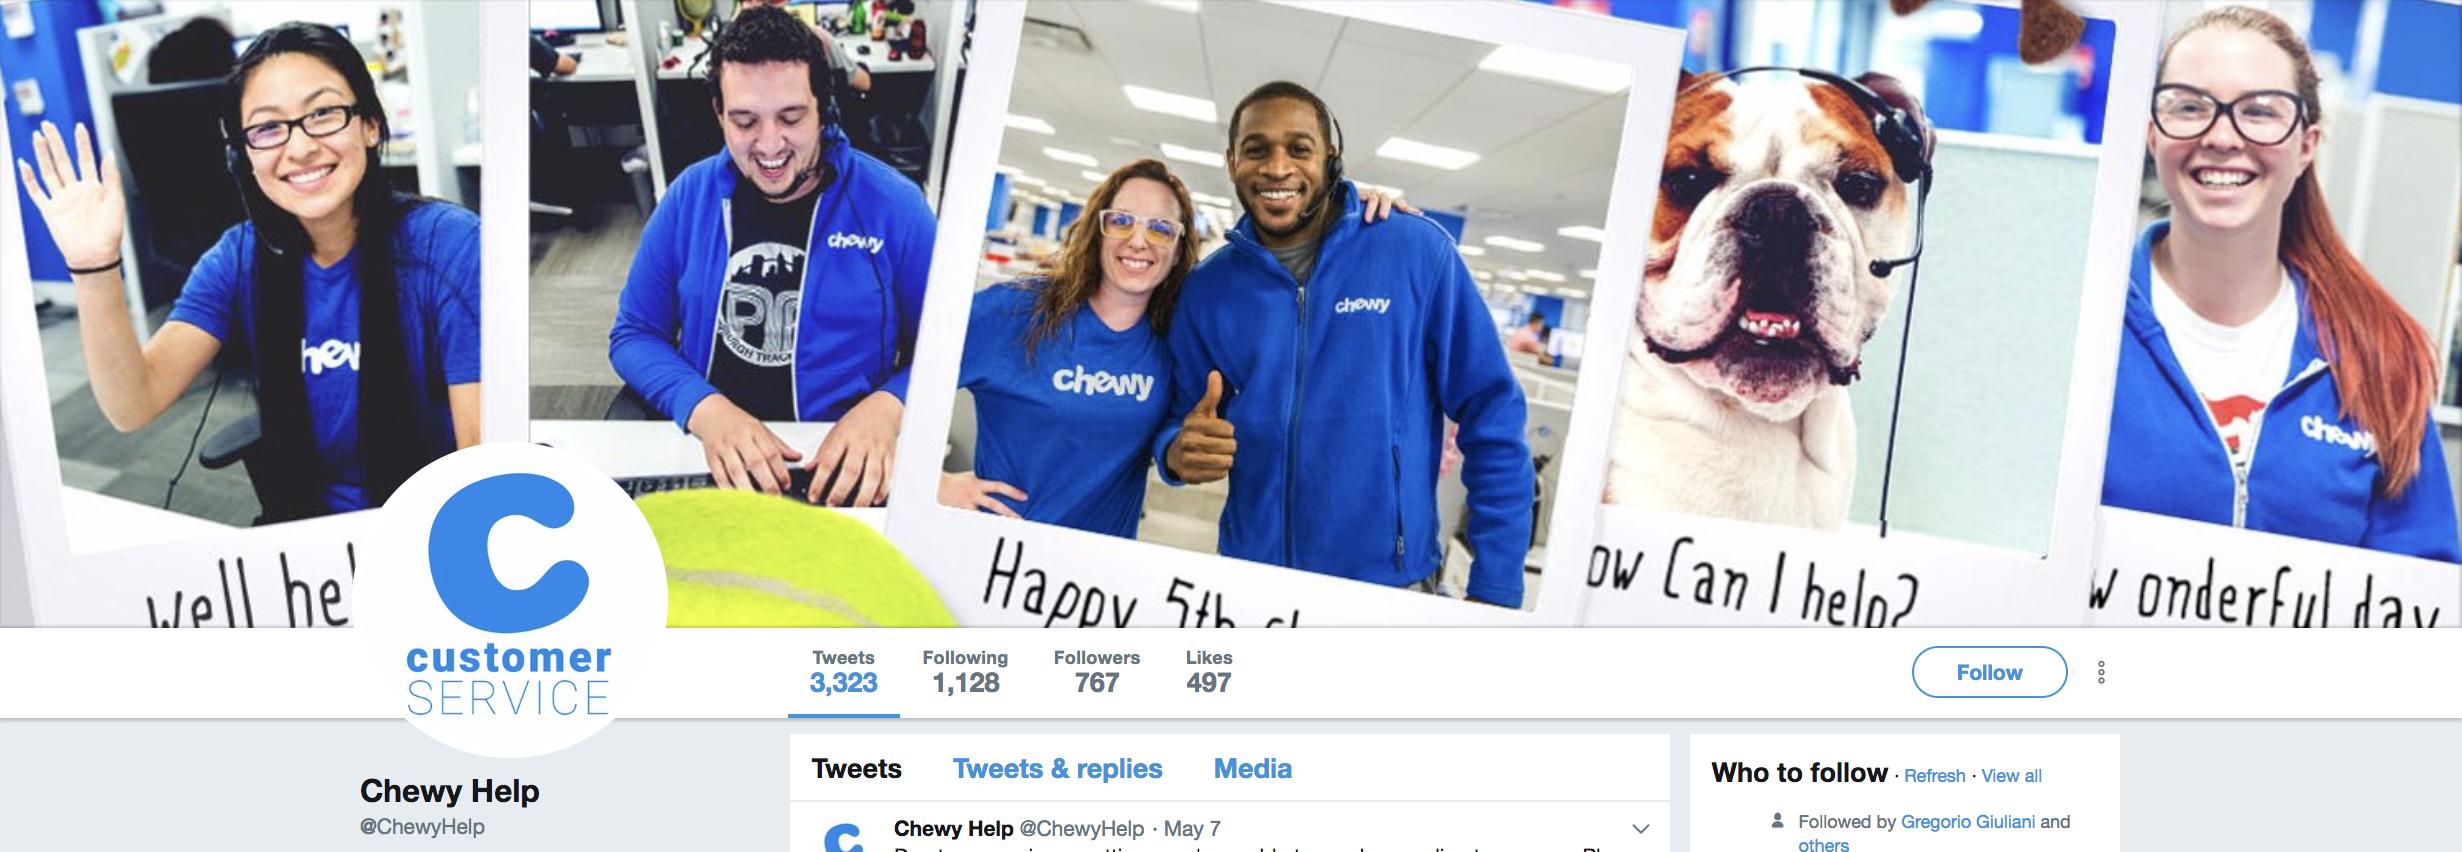 customer-support-twitter-banner